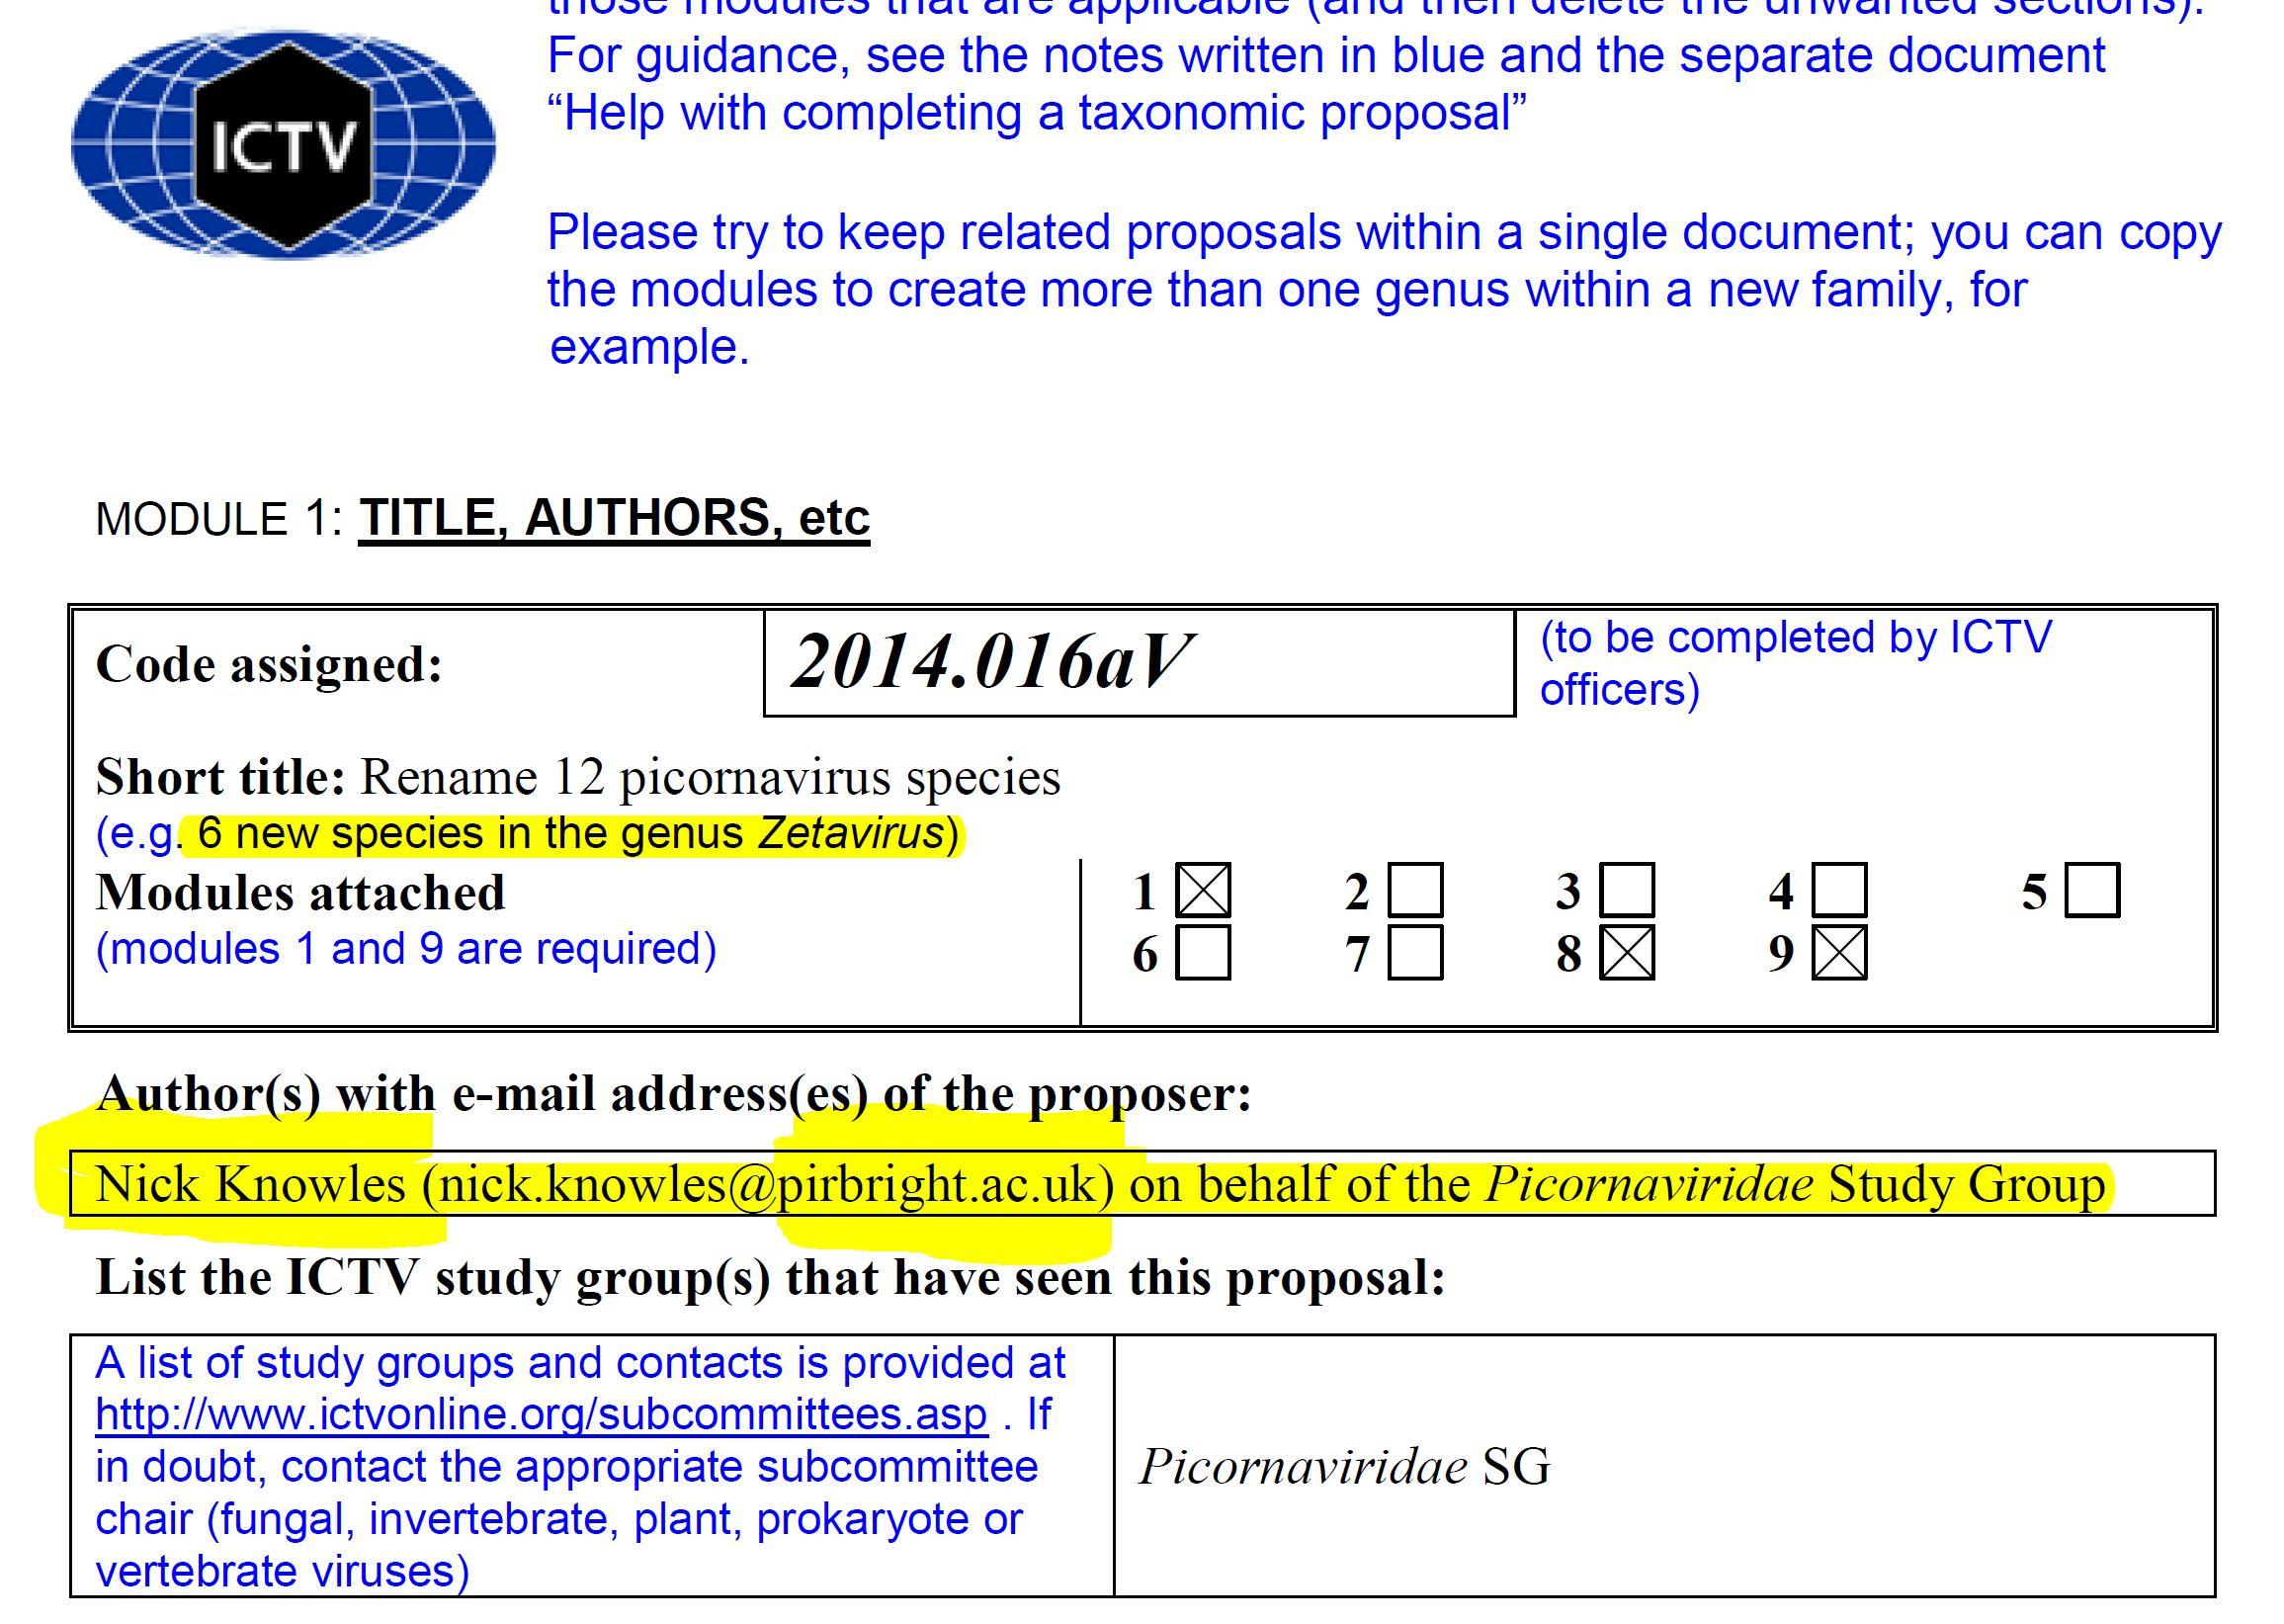 Nick Knowles. (Jul. 07, 2014). 6 new species in the genus Zetavirus on behalf of the Picornaviridae Study Group, nick.knowles@pirbright.ac.uk, Code No. 2014.01aV. International Committee on Taxonomy of Viruses (ICTV).